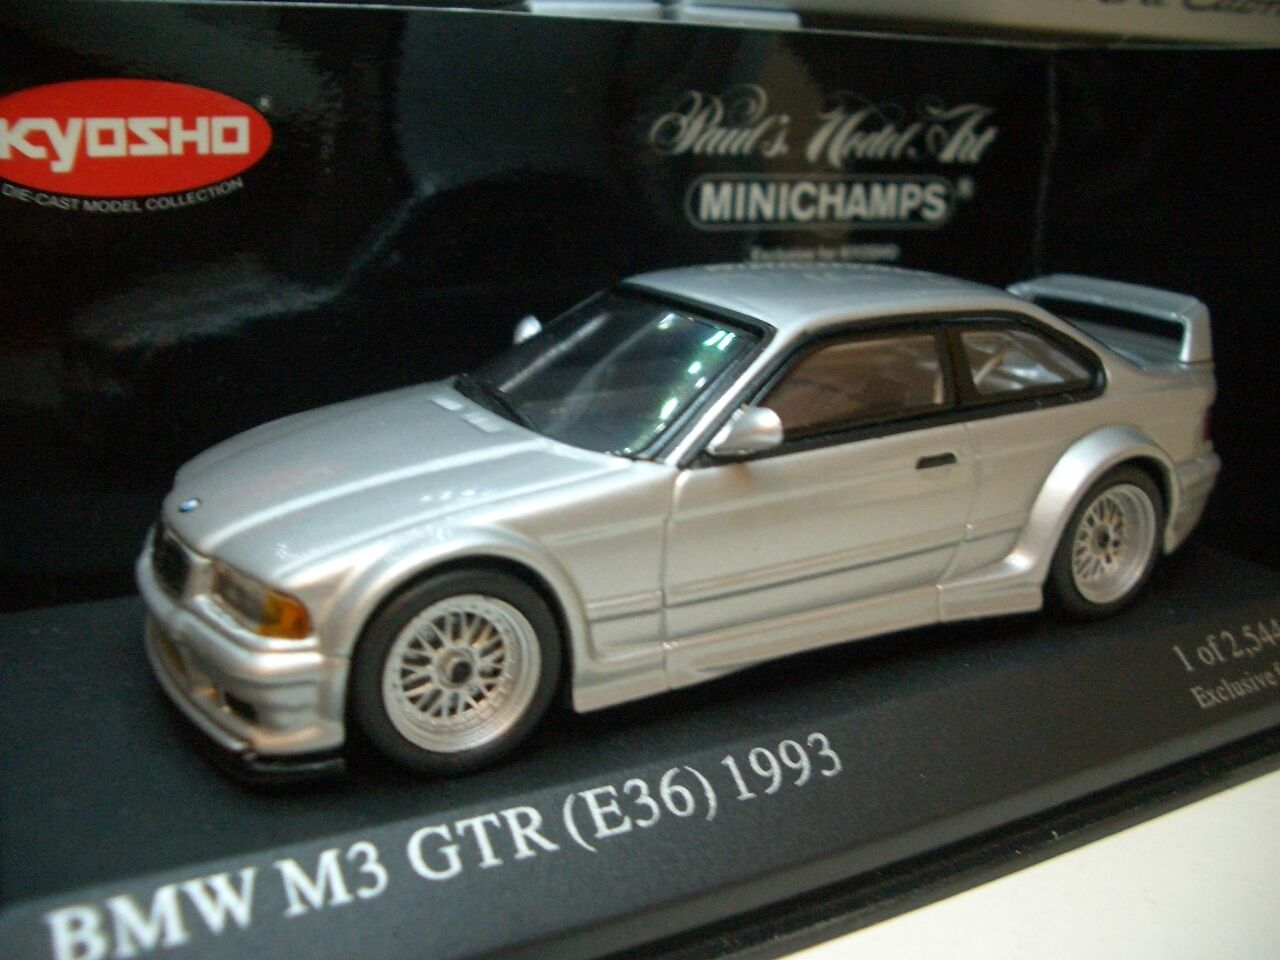 1 43 Kyosho Minichamps BMW M3 GTR E36 (1993) Diecast